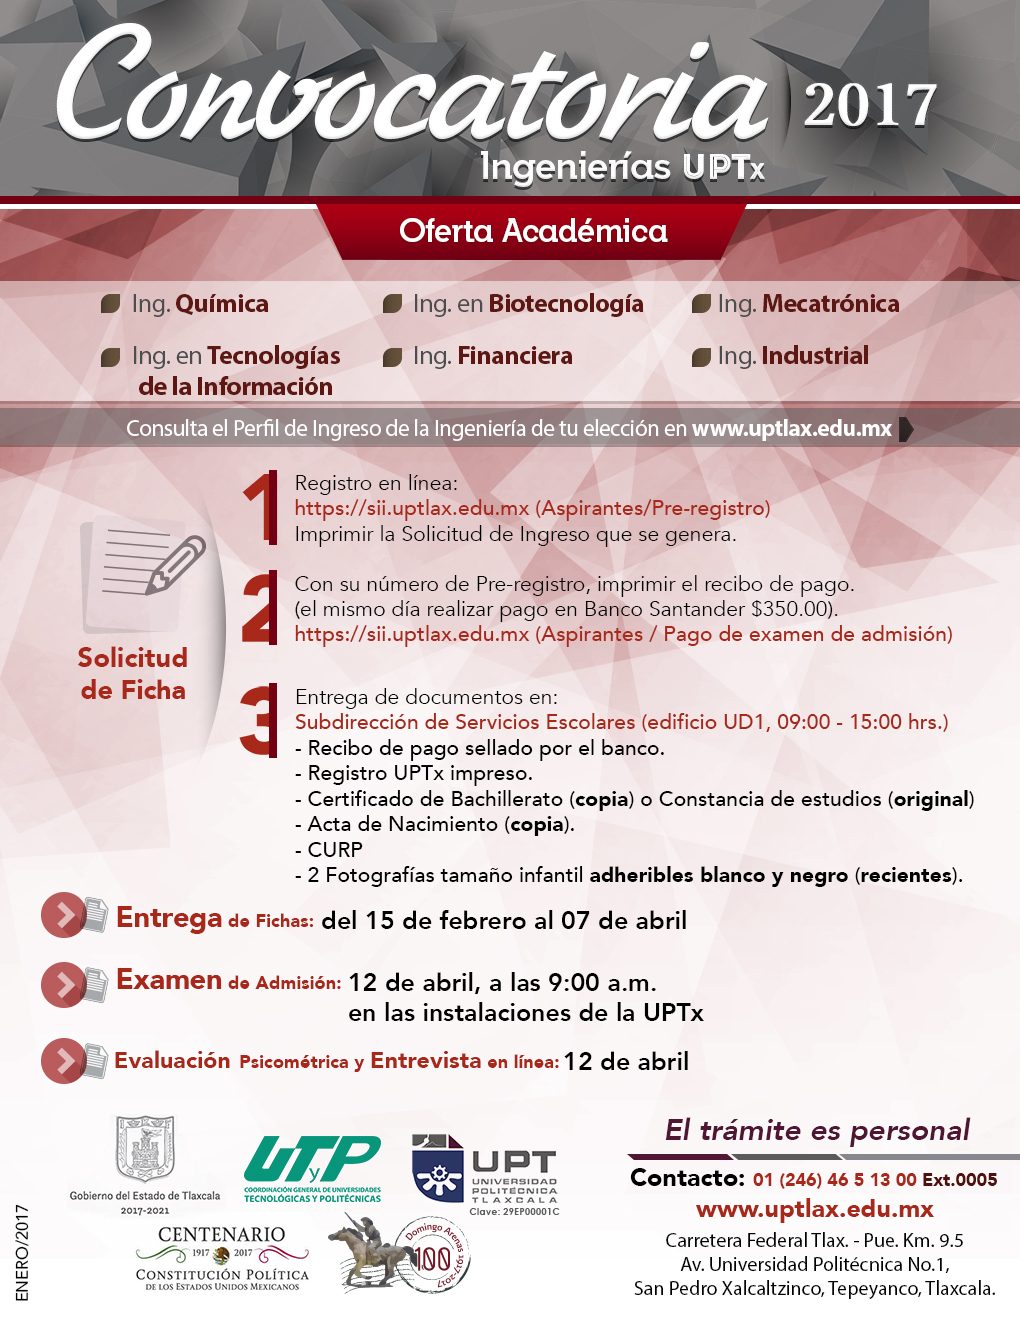 Convocatoria 2017 universidad polit cnica de tlaxcala for Convocatoria de docentes 2017